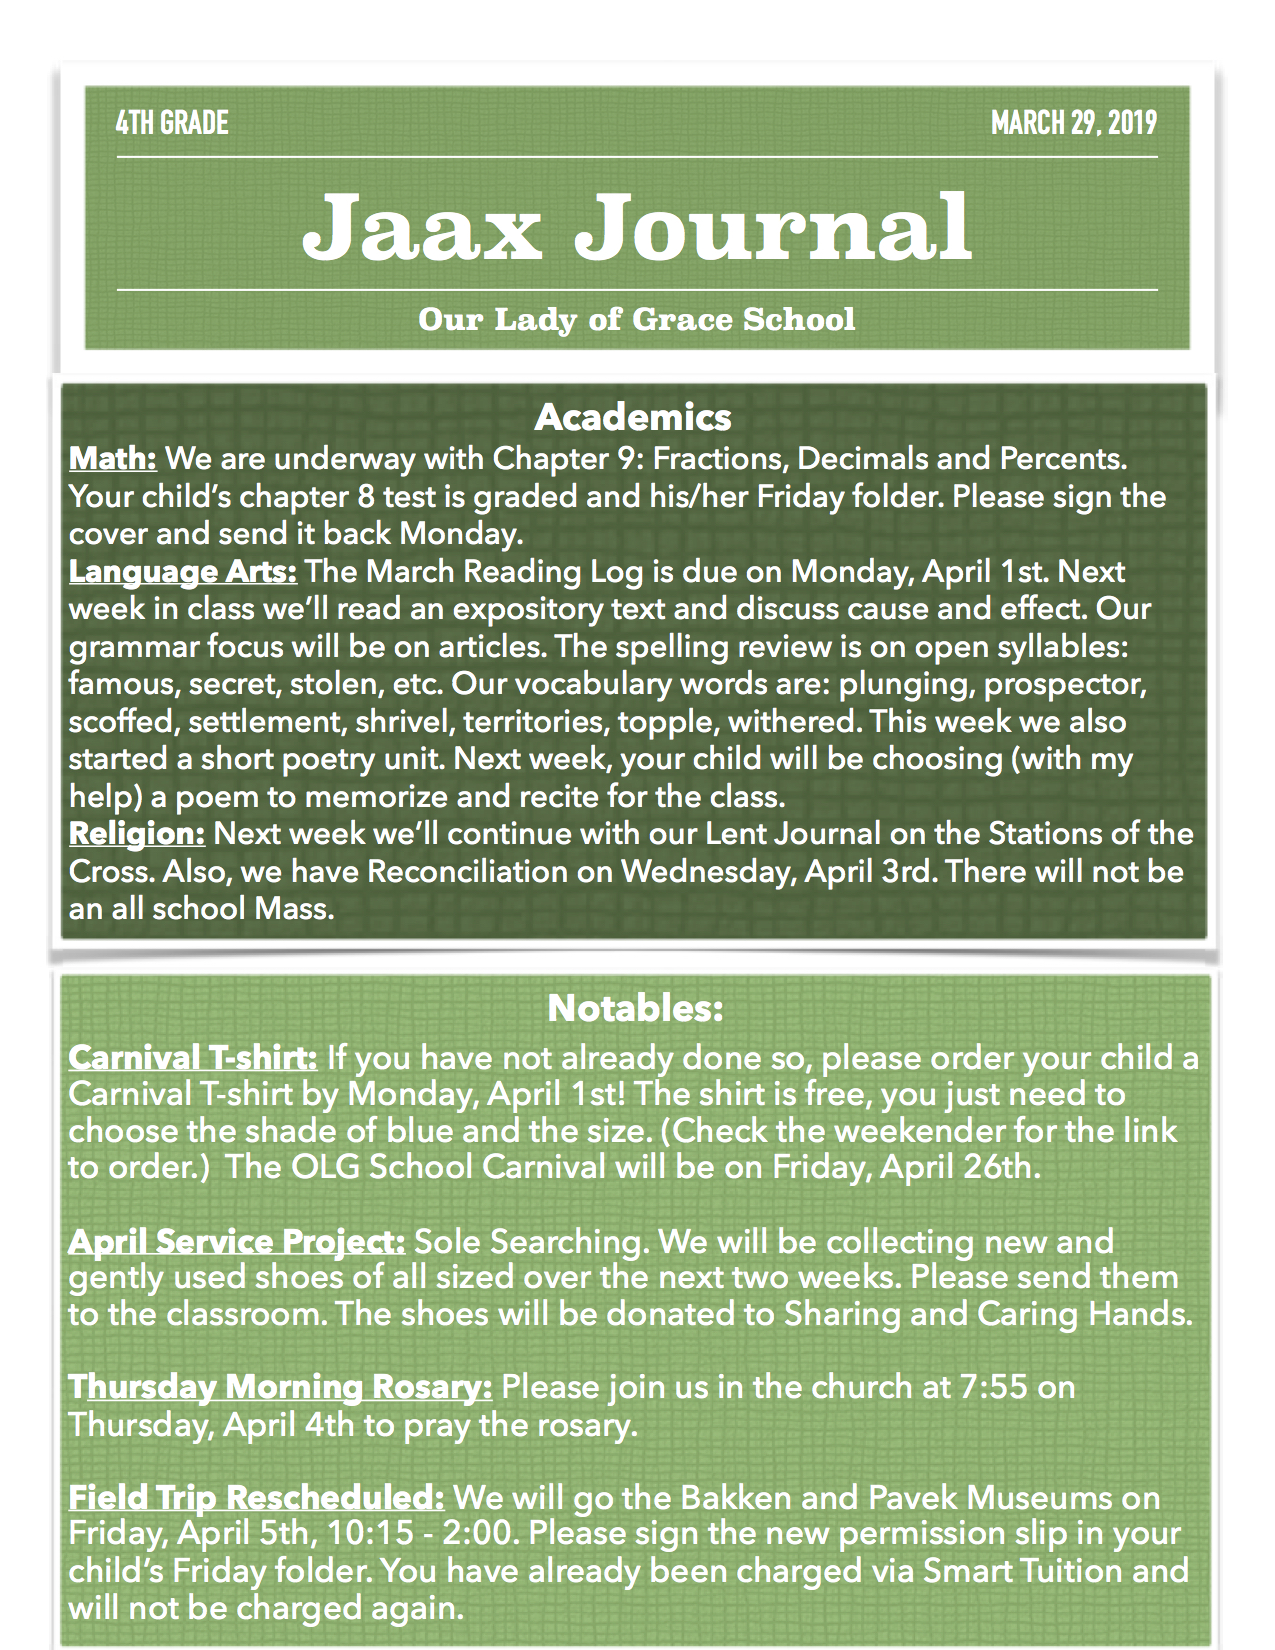 JaaxJournal3-29-19.jpg